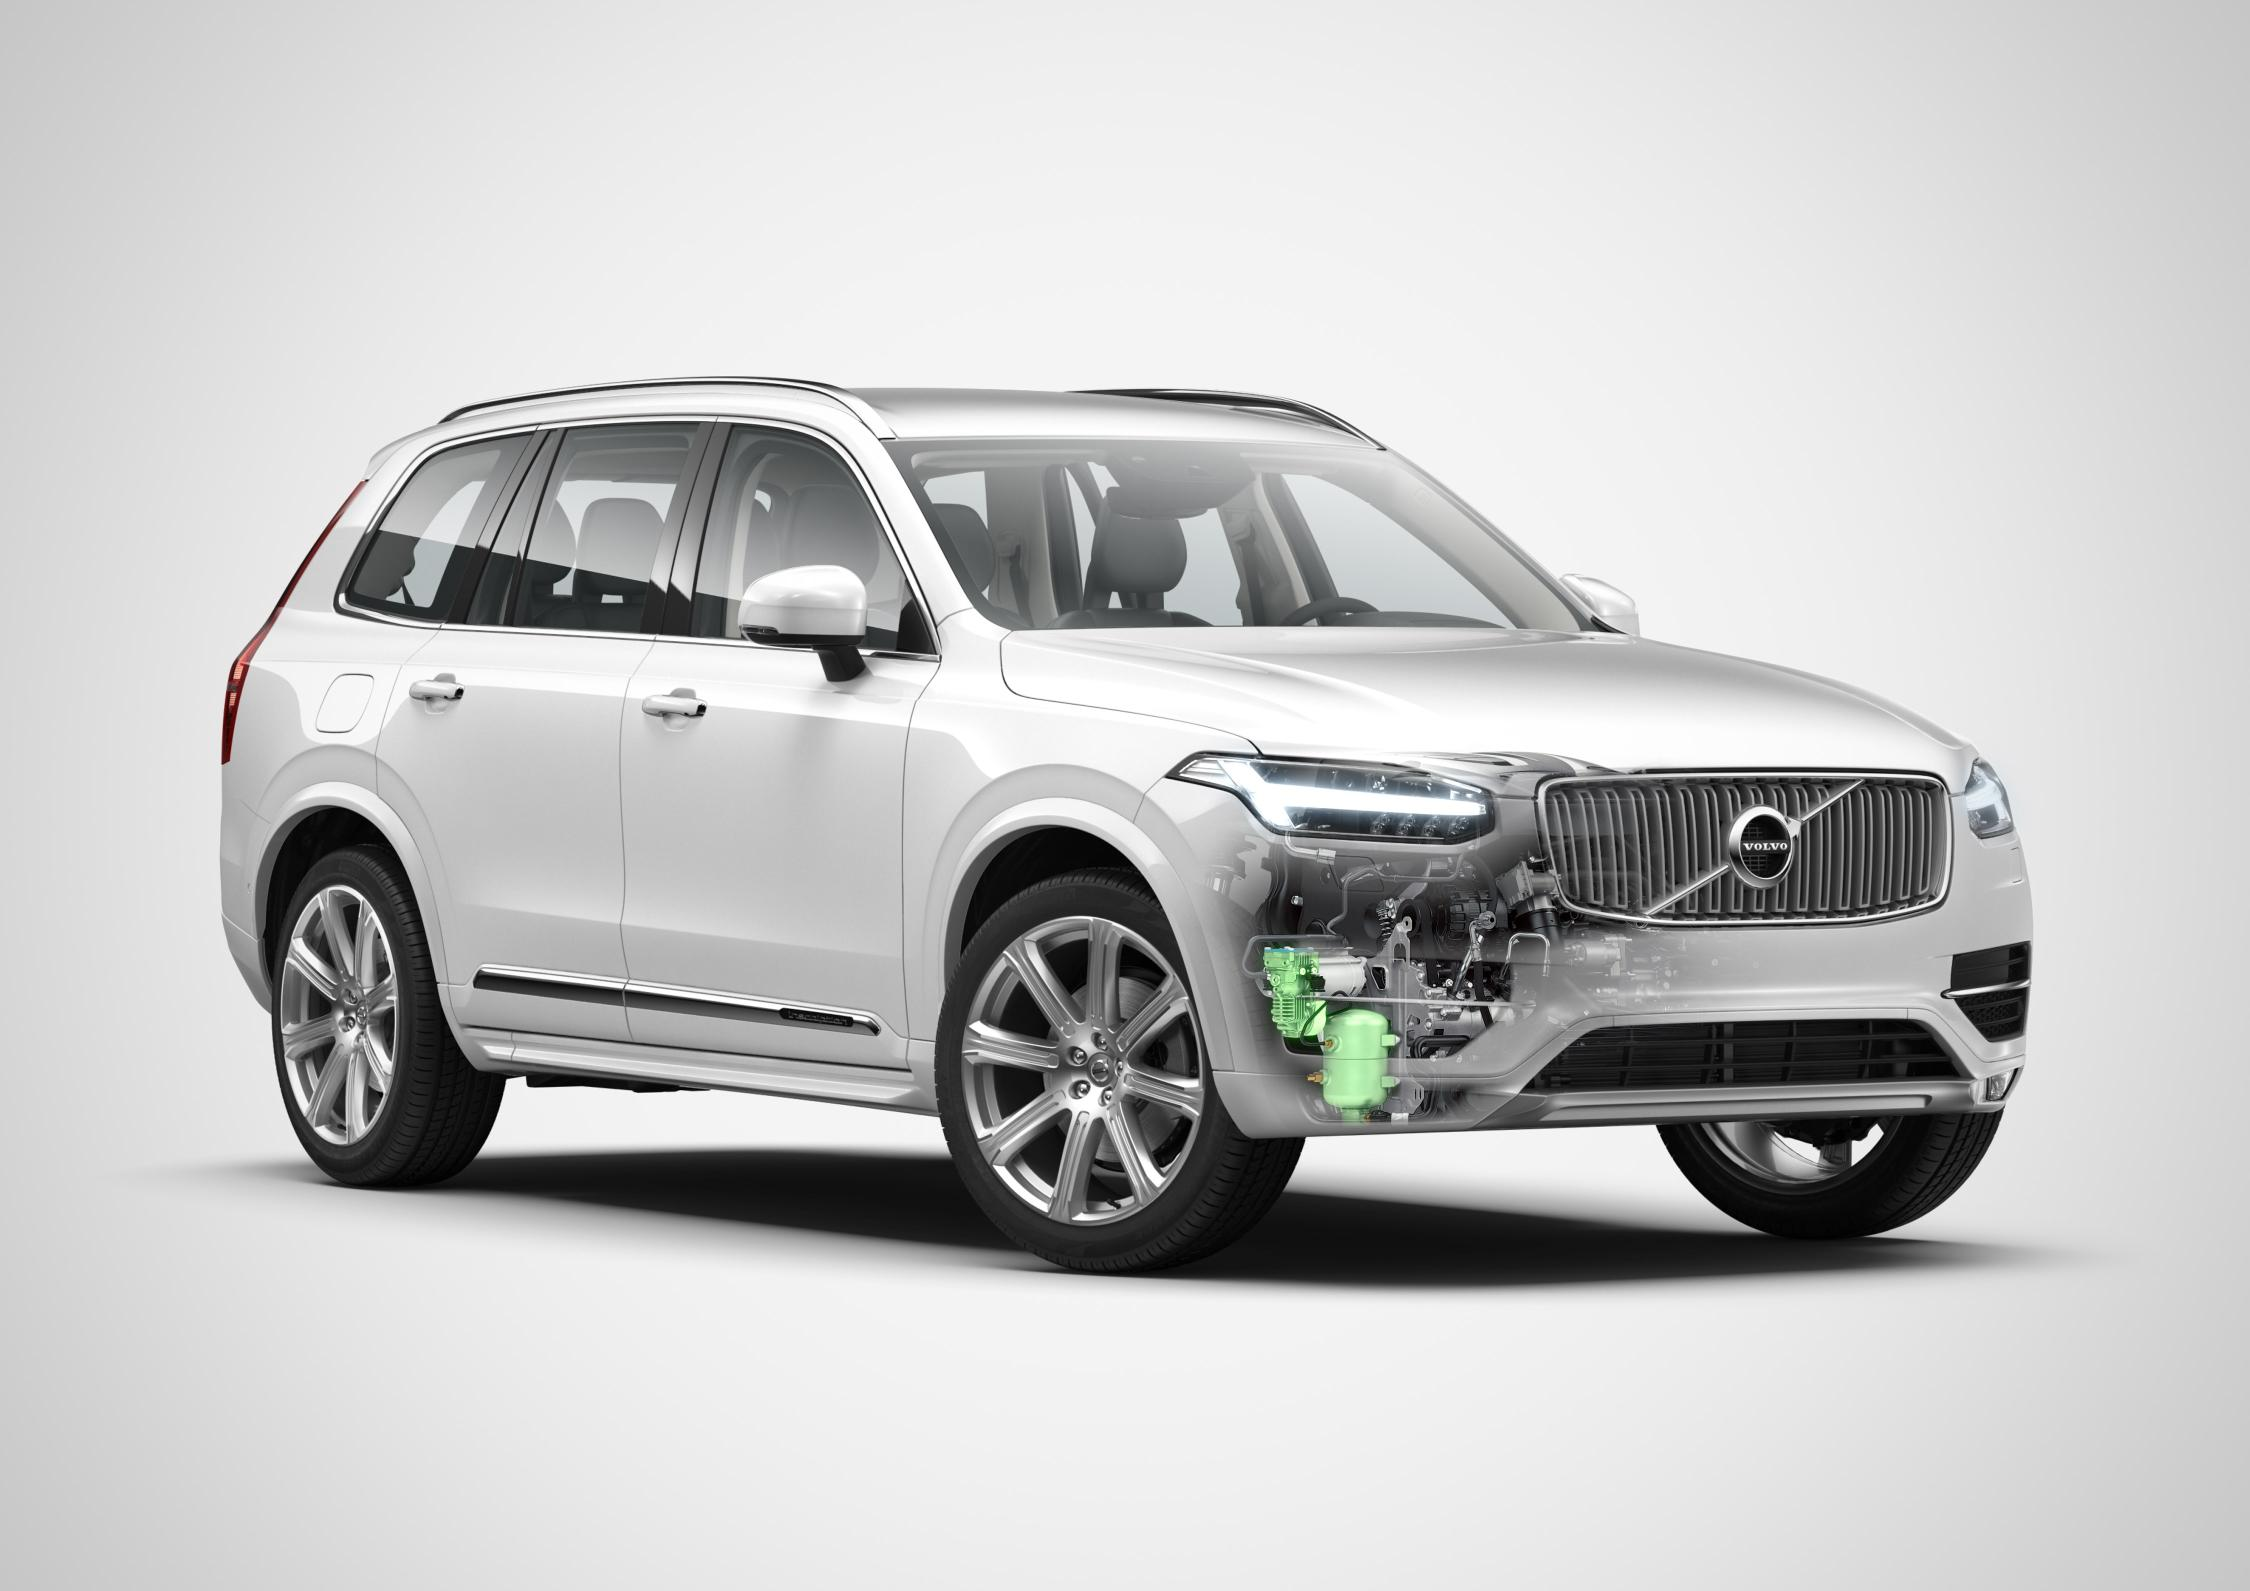 2017 Volvo Updates: XC90 D5 PowerPulse, T5 AWD, S60 Cross Country D3 - autoevolution